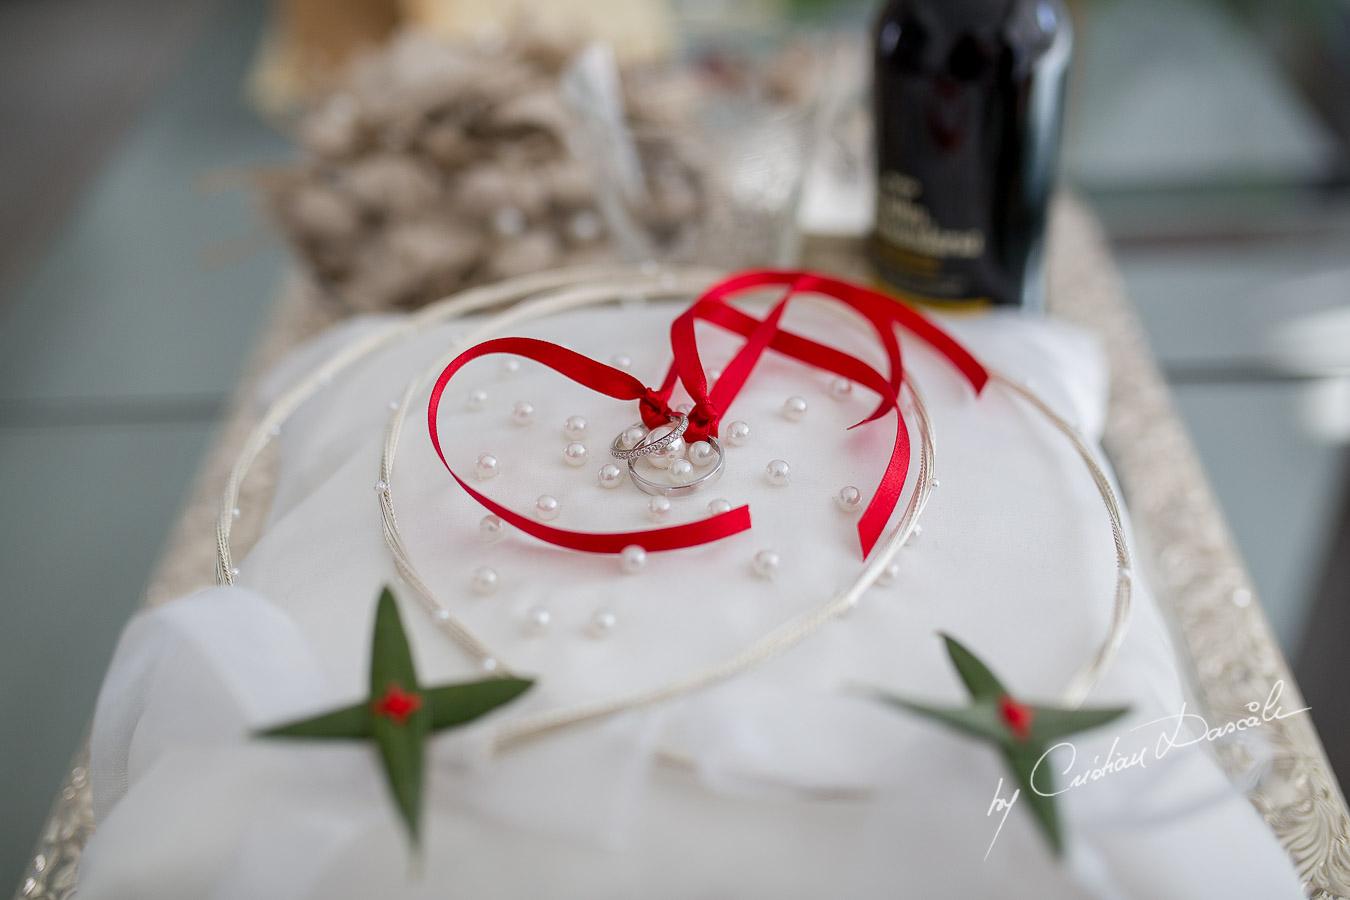 Wedding of Costas & Maria - Nicosia, Agios Dometios 06